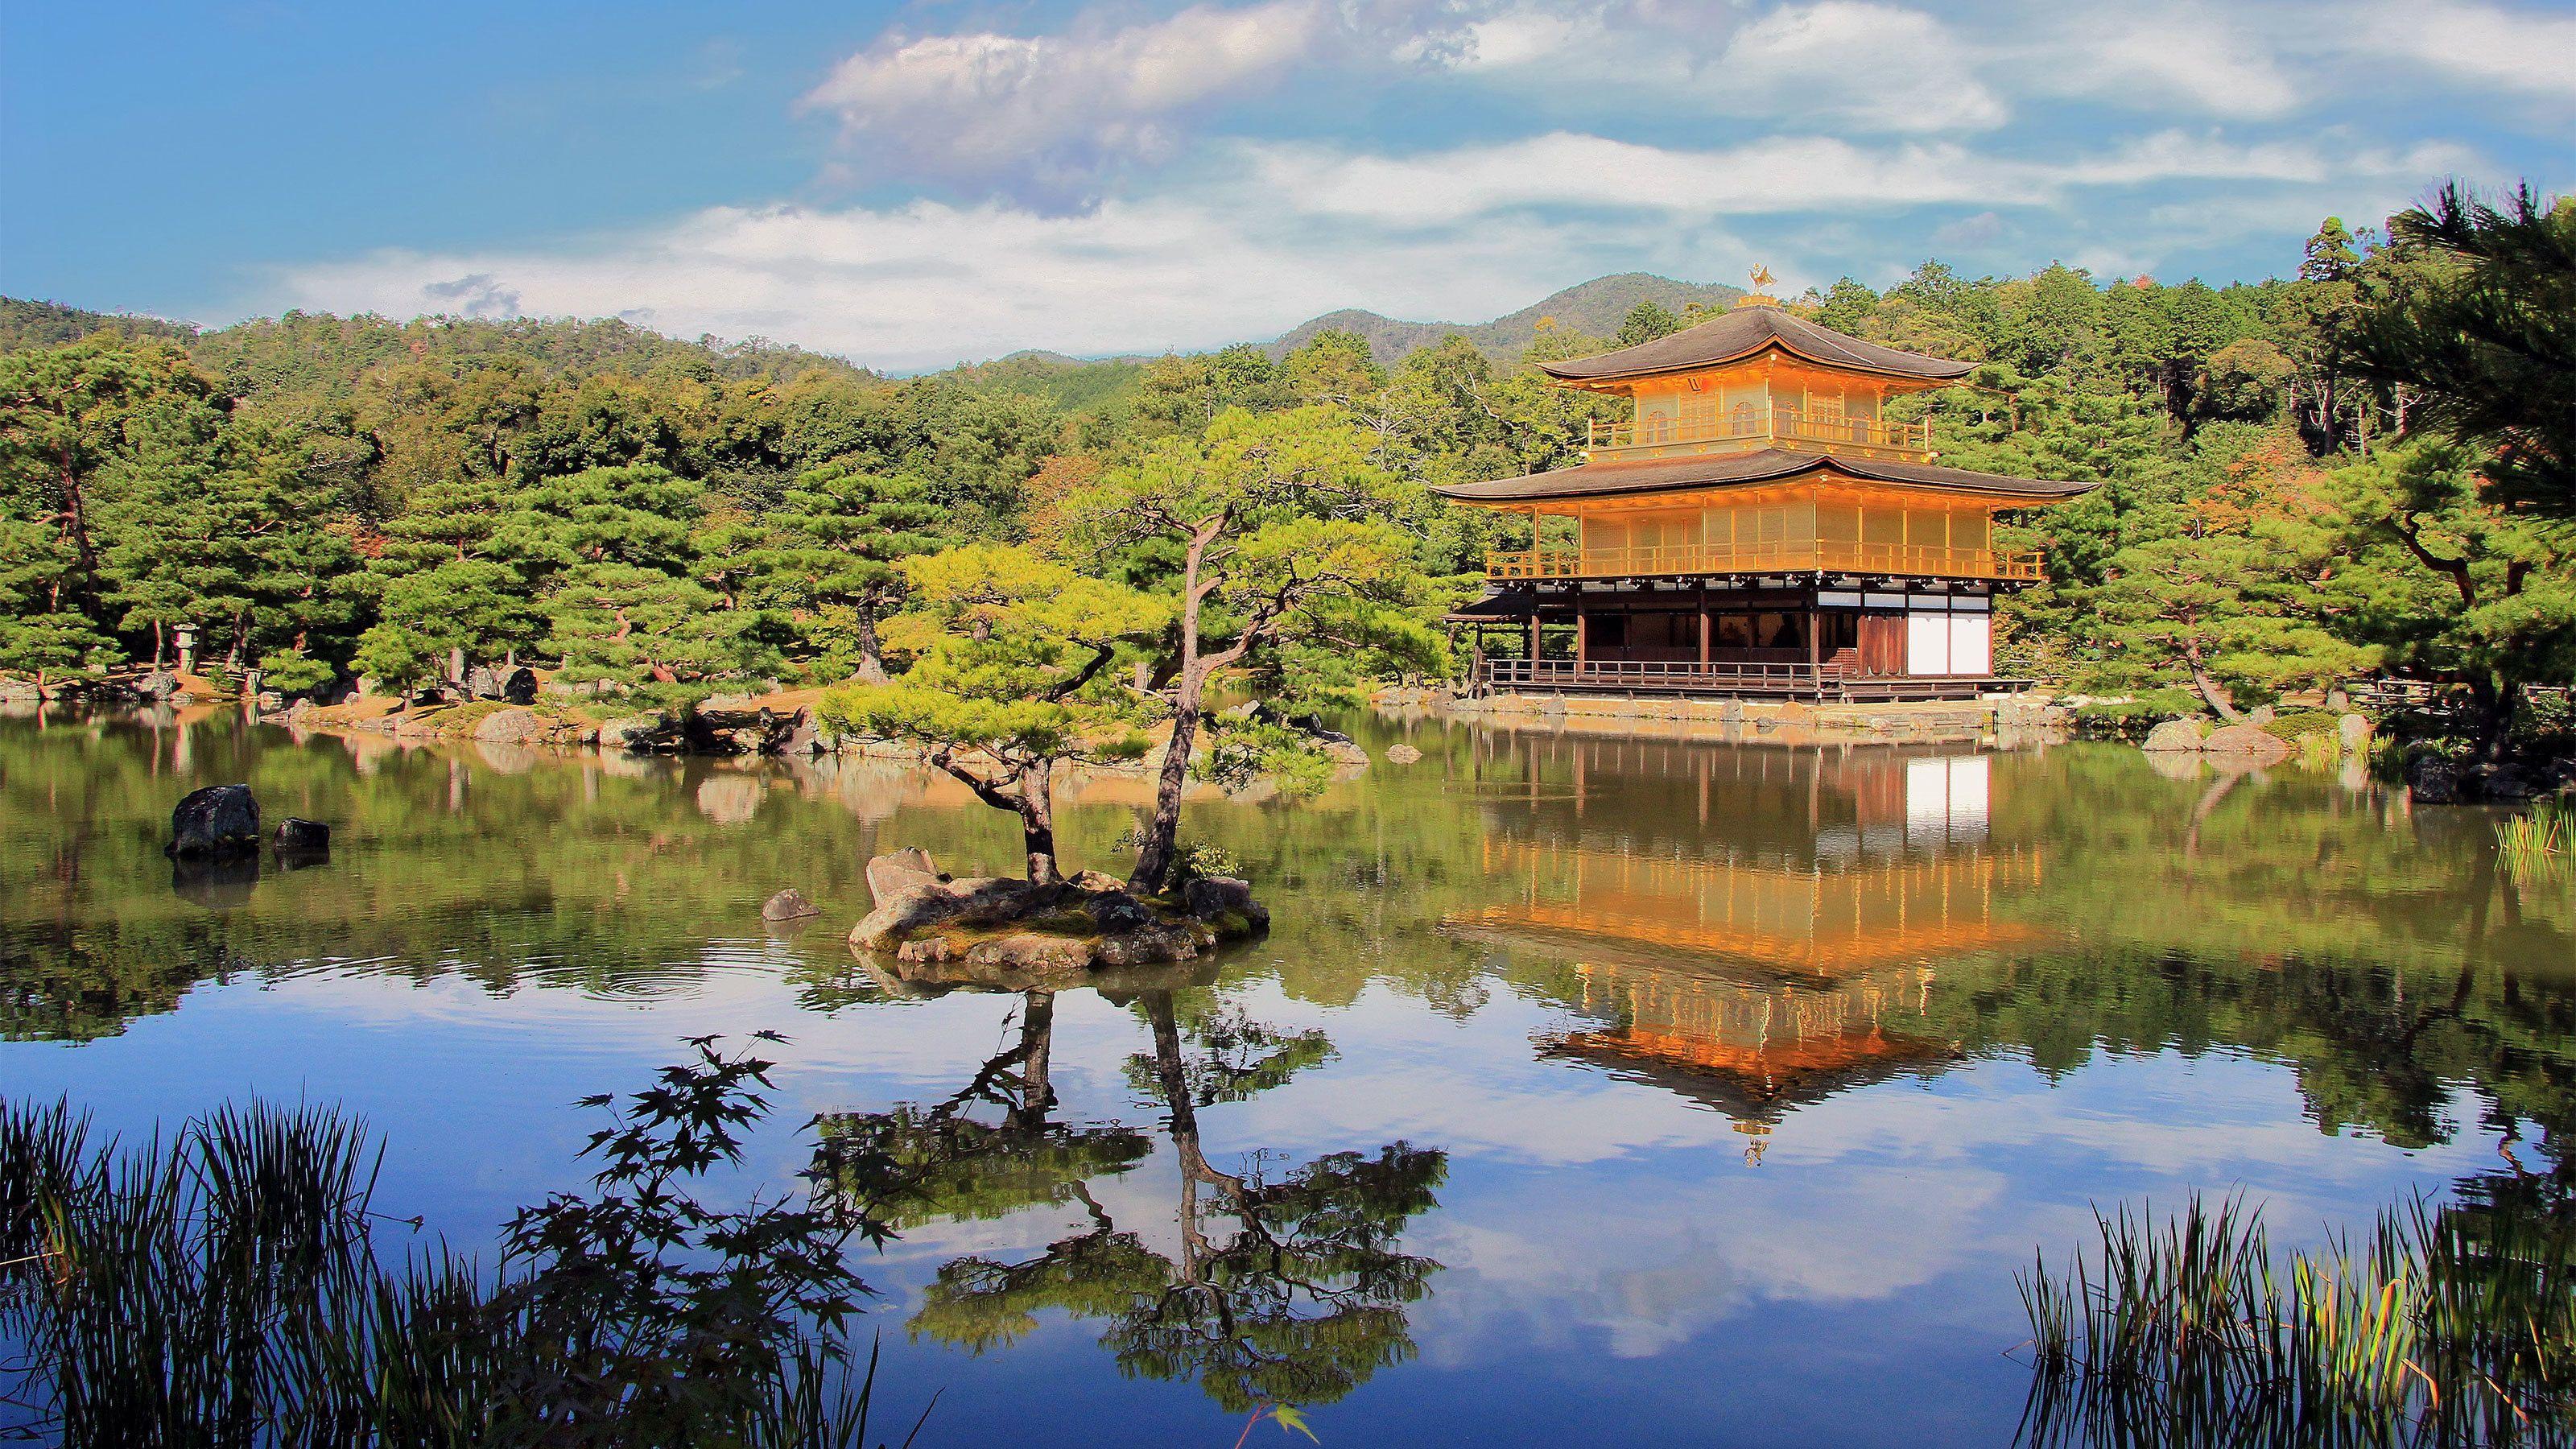 Day view of Kinkaku-ji temple in Japan